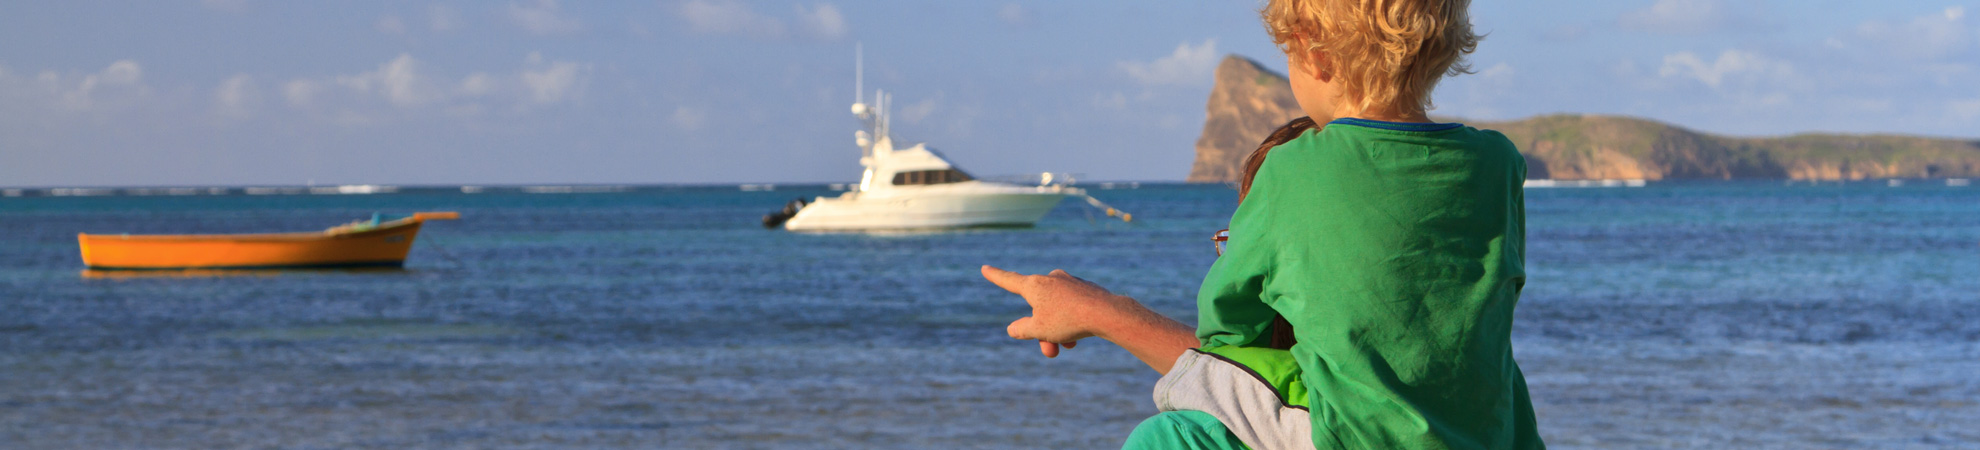 Voyage Île Maurice en famille